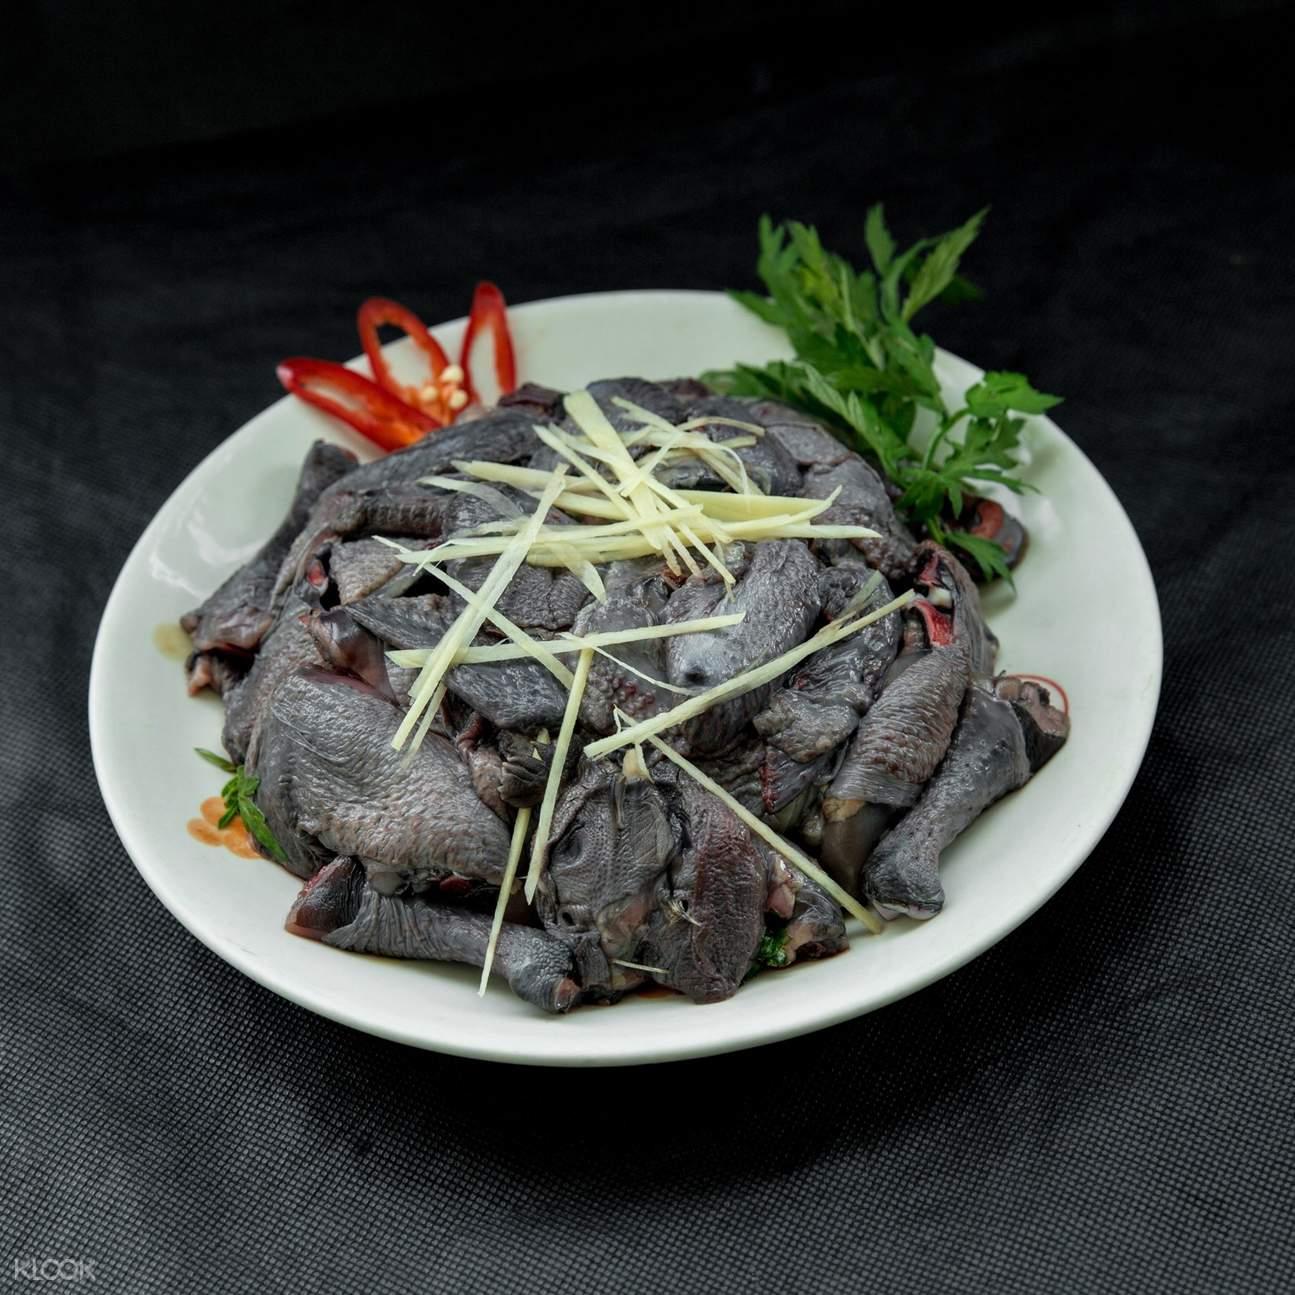 tay bac specialty - black chicken